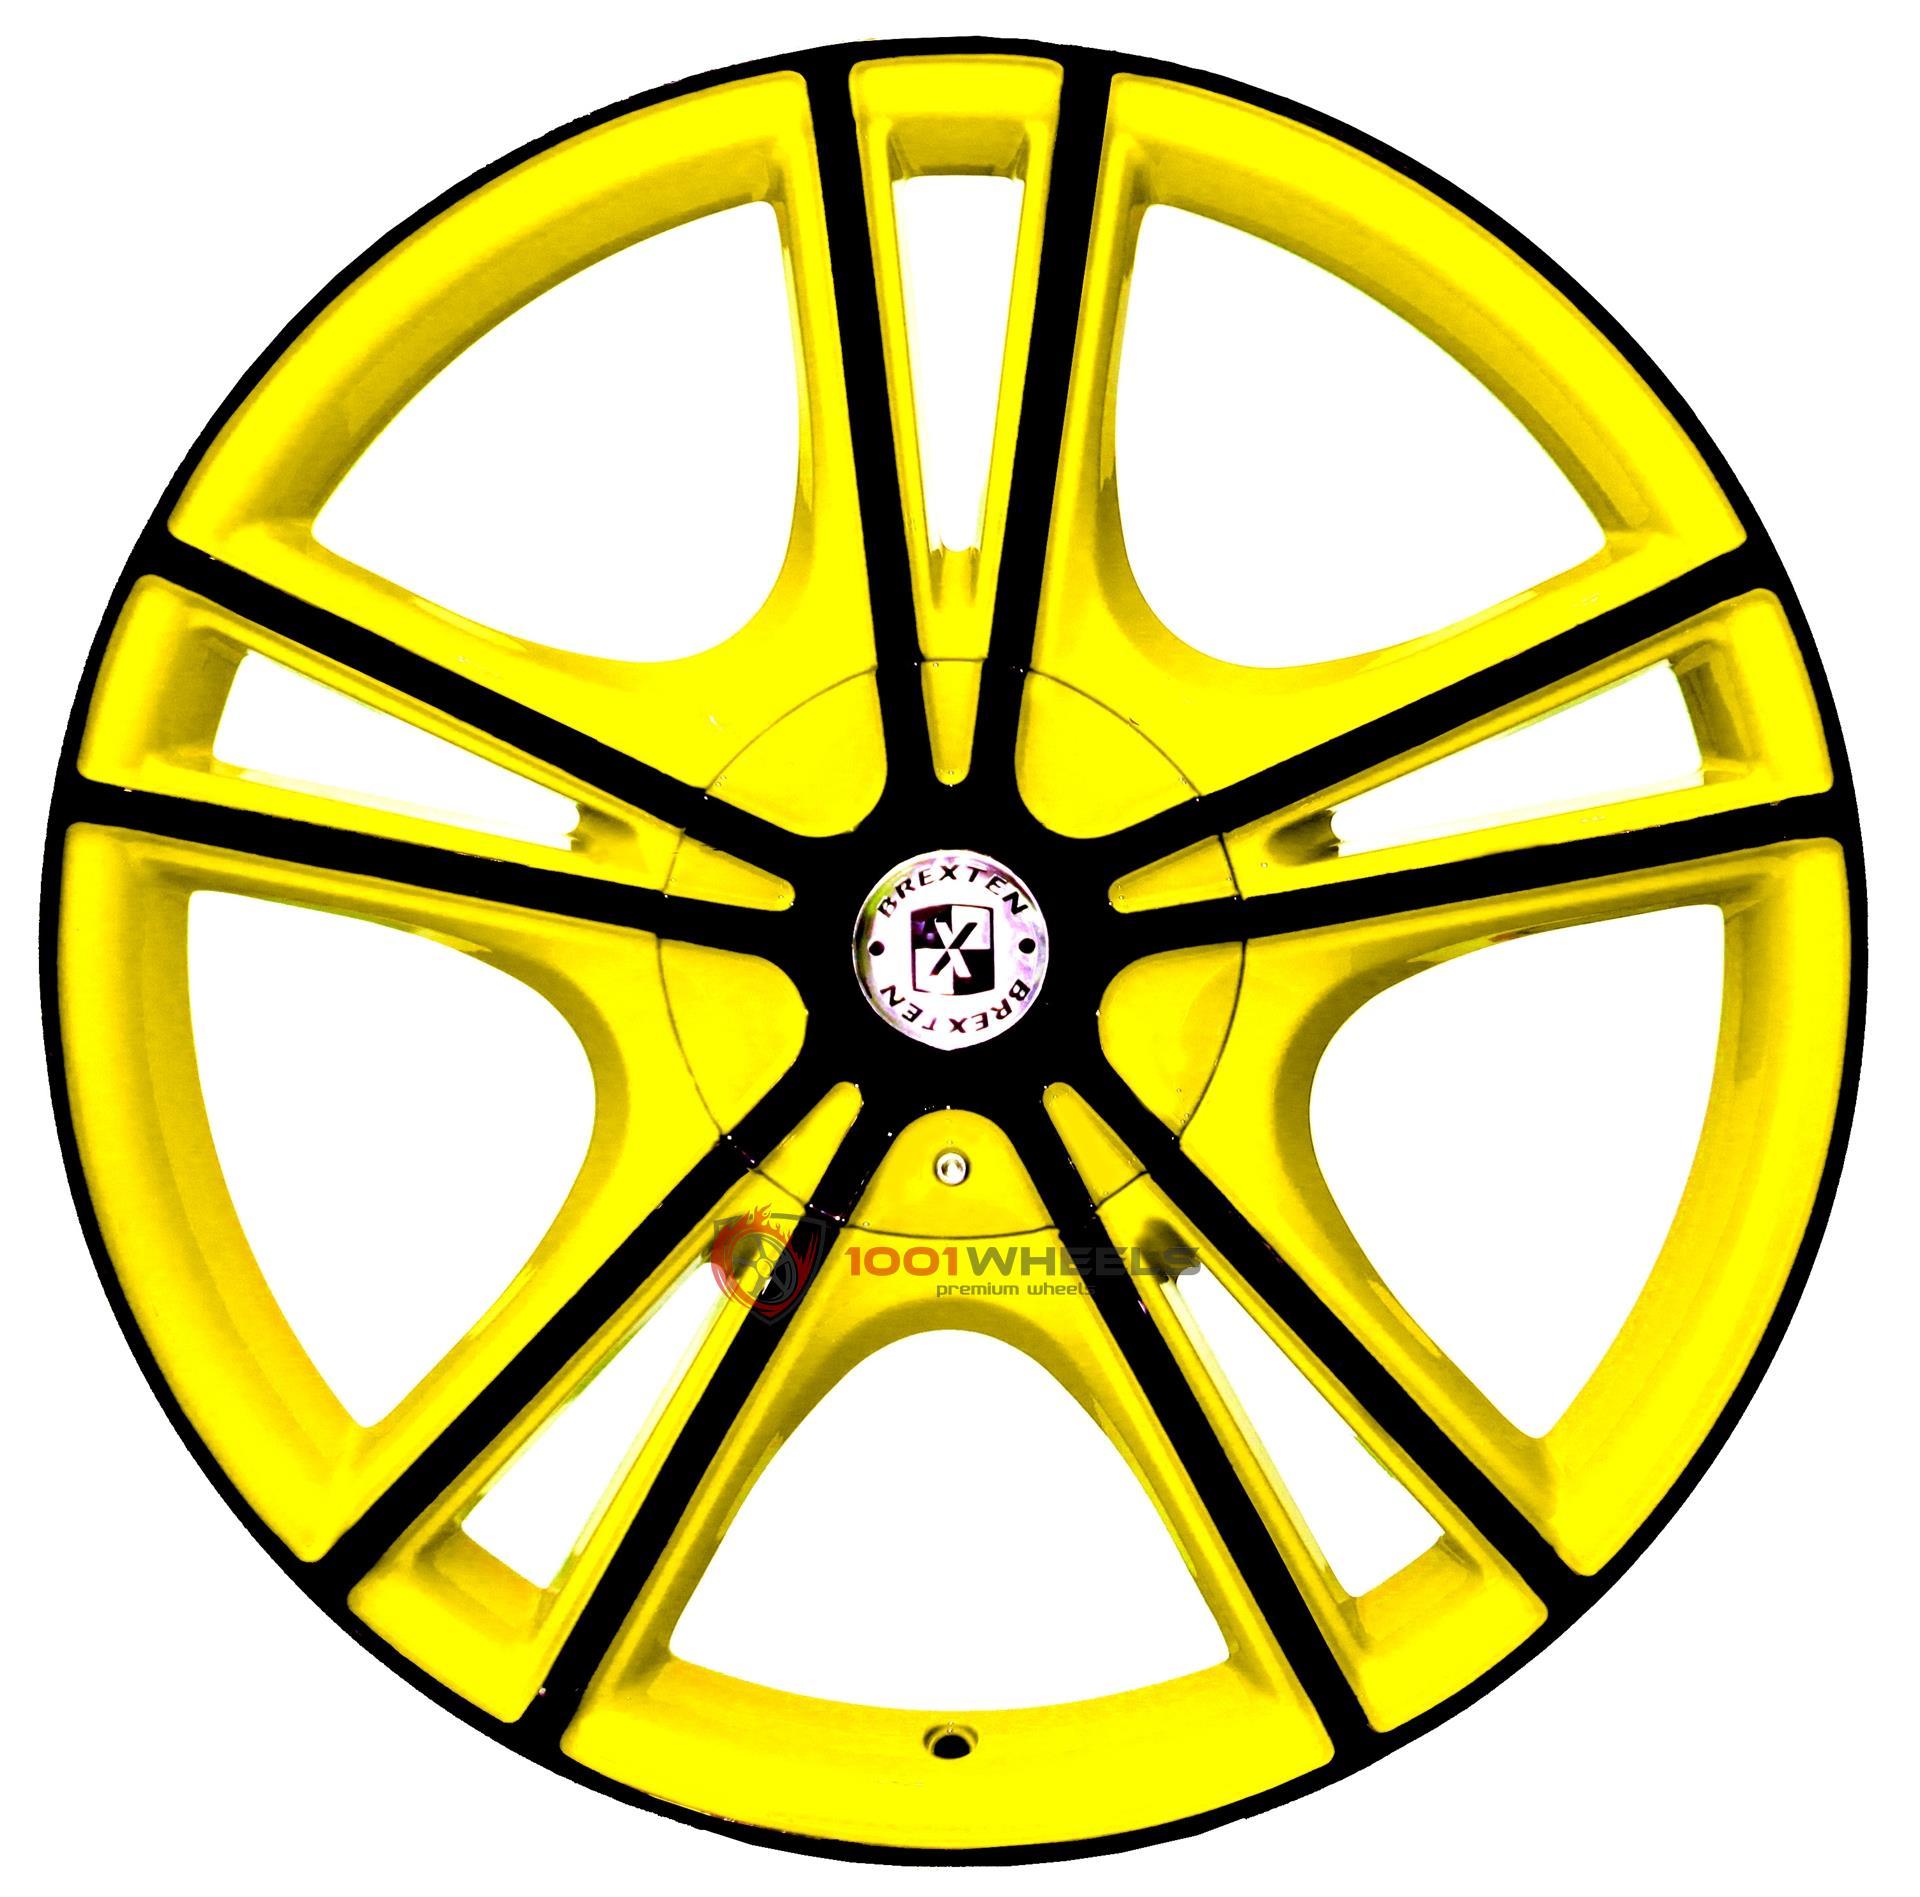 BREXTEN CUSTOM BX-25 yellow-with-black